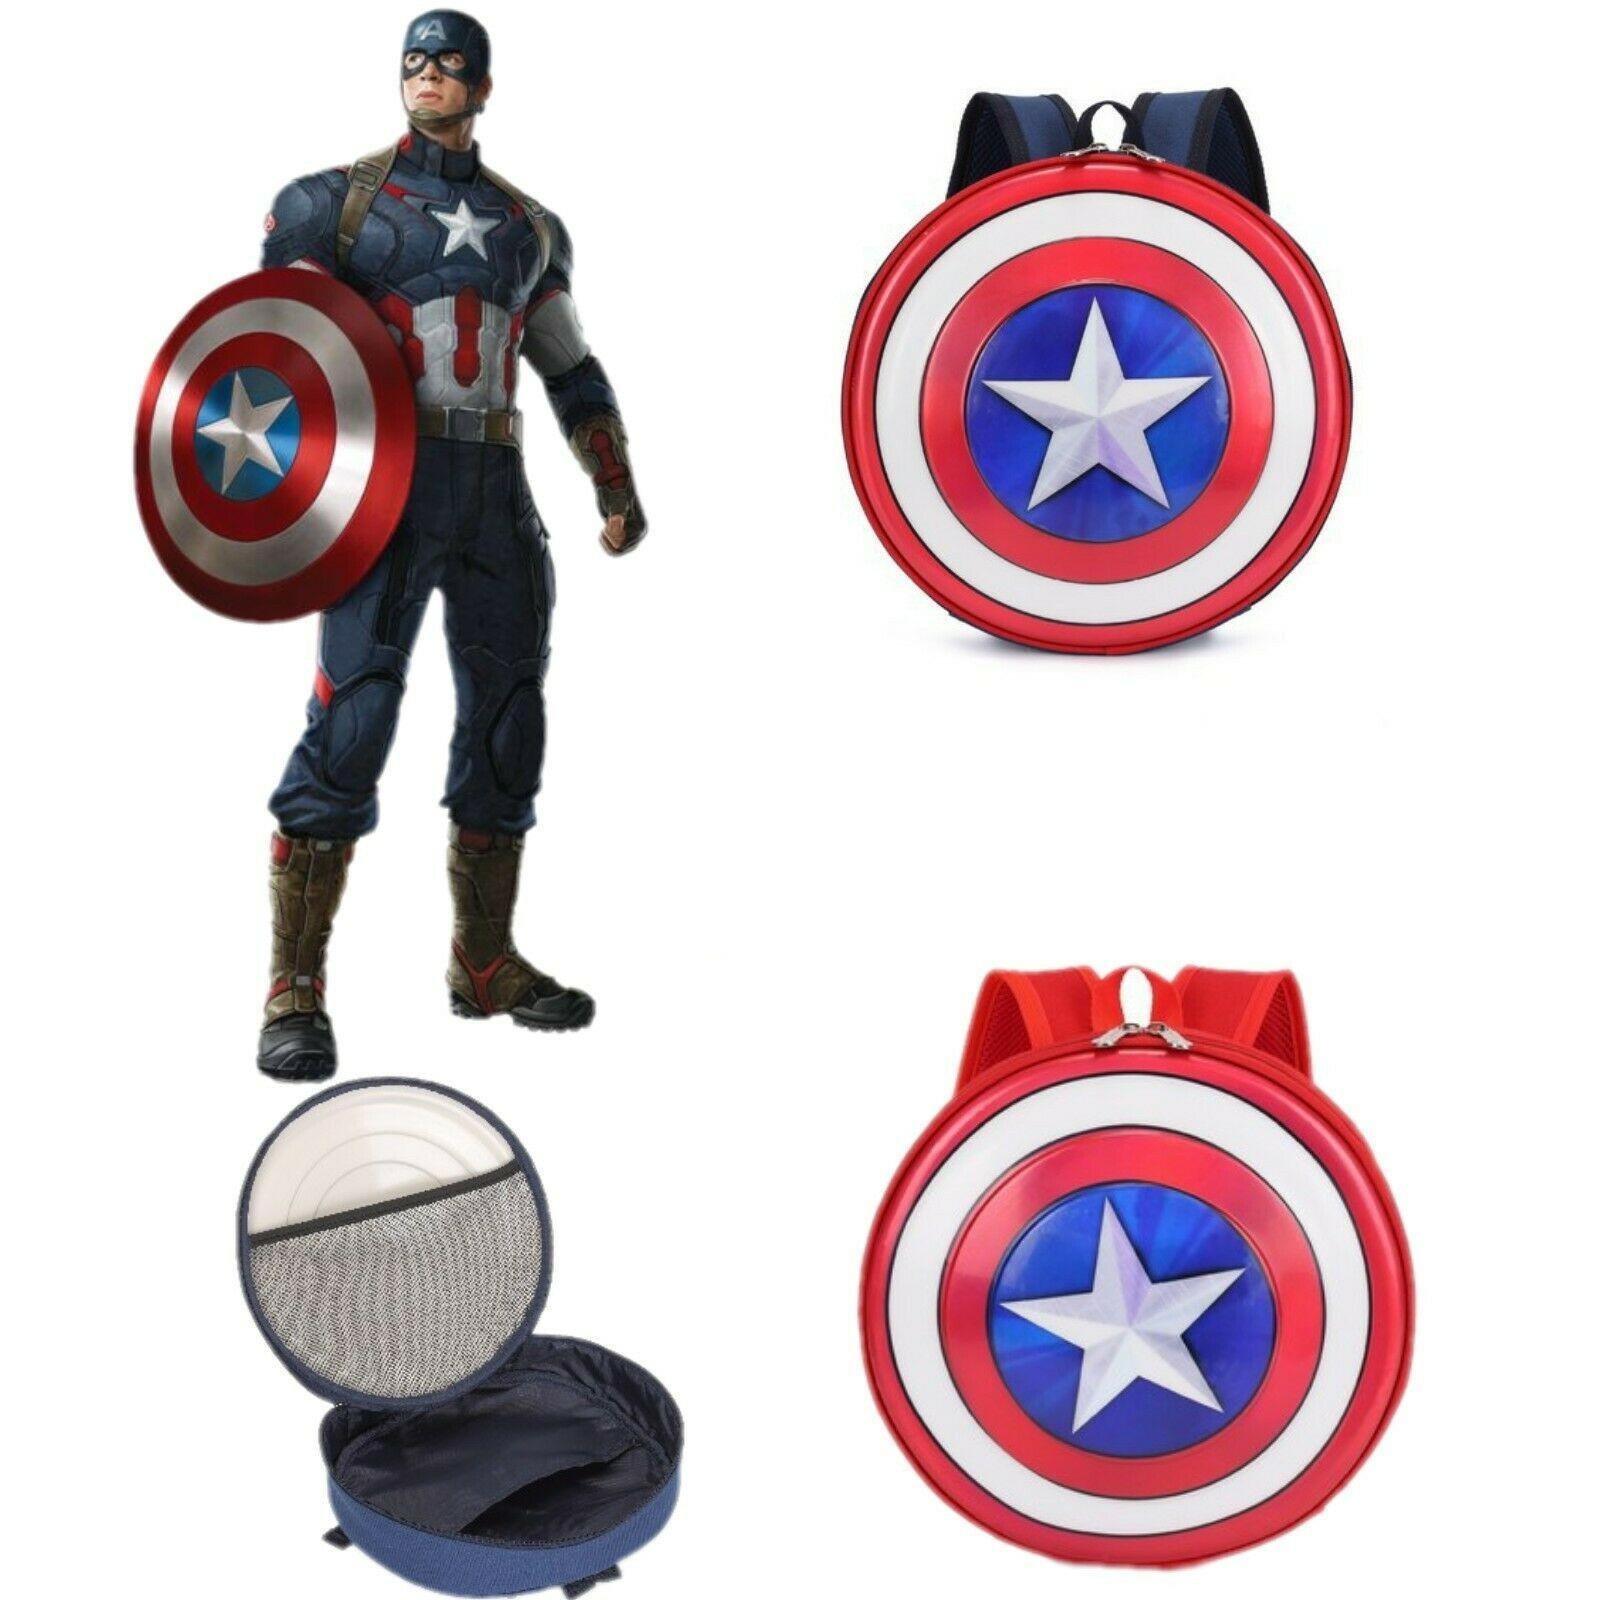 Avengers Hulk Thor Capitan America Iron Man Guanti Bambini Borsa Regalo